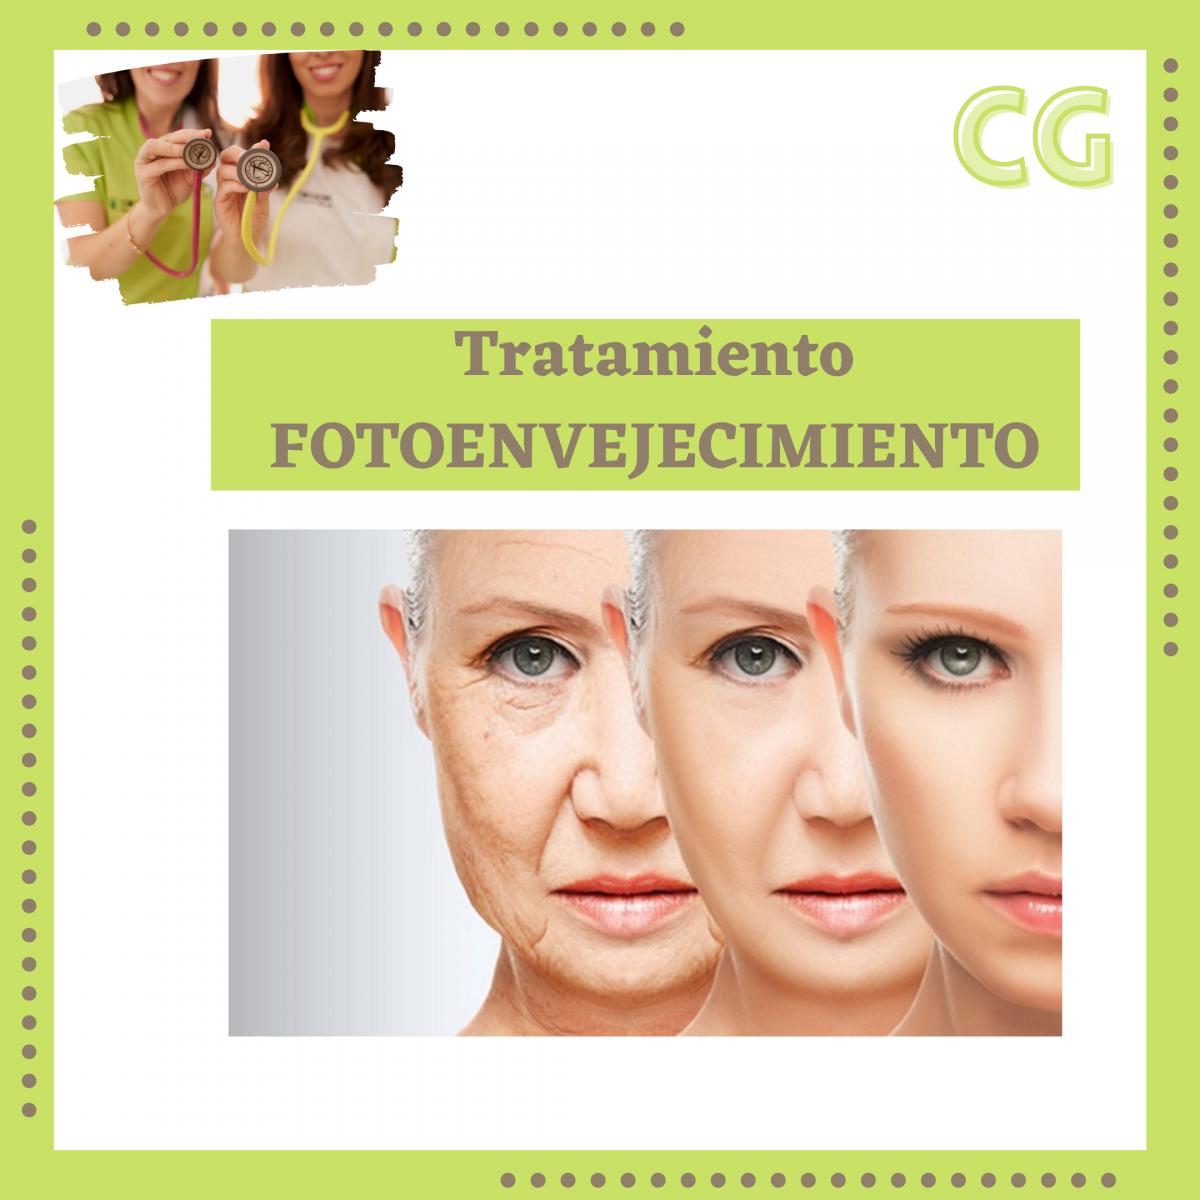 04 FOTOENVEJECIMIENTO 1200x1200 - Medicina Estética